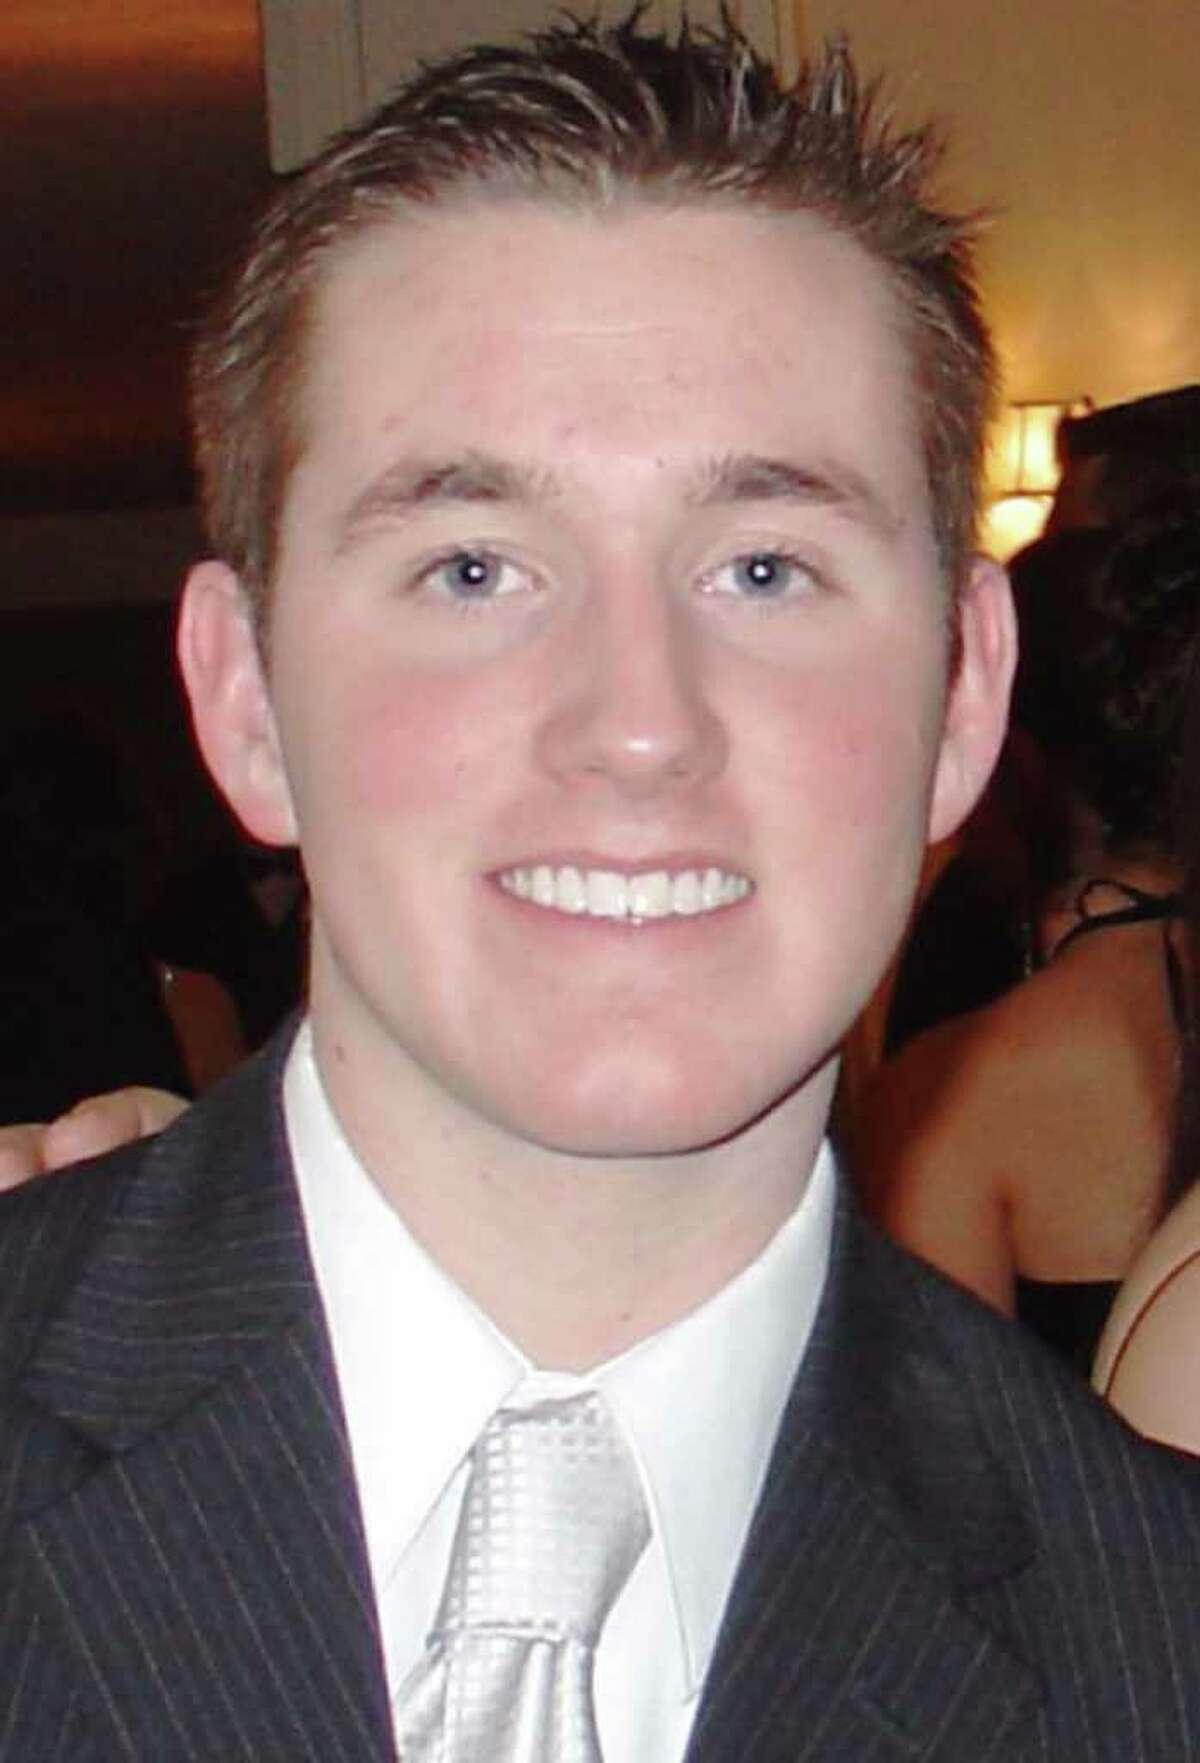 Chris LaRocque